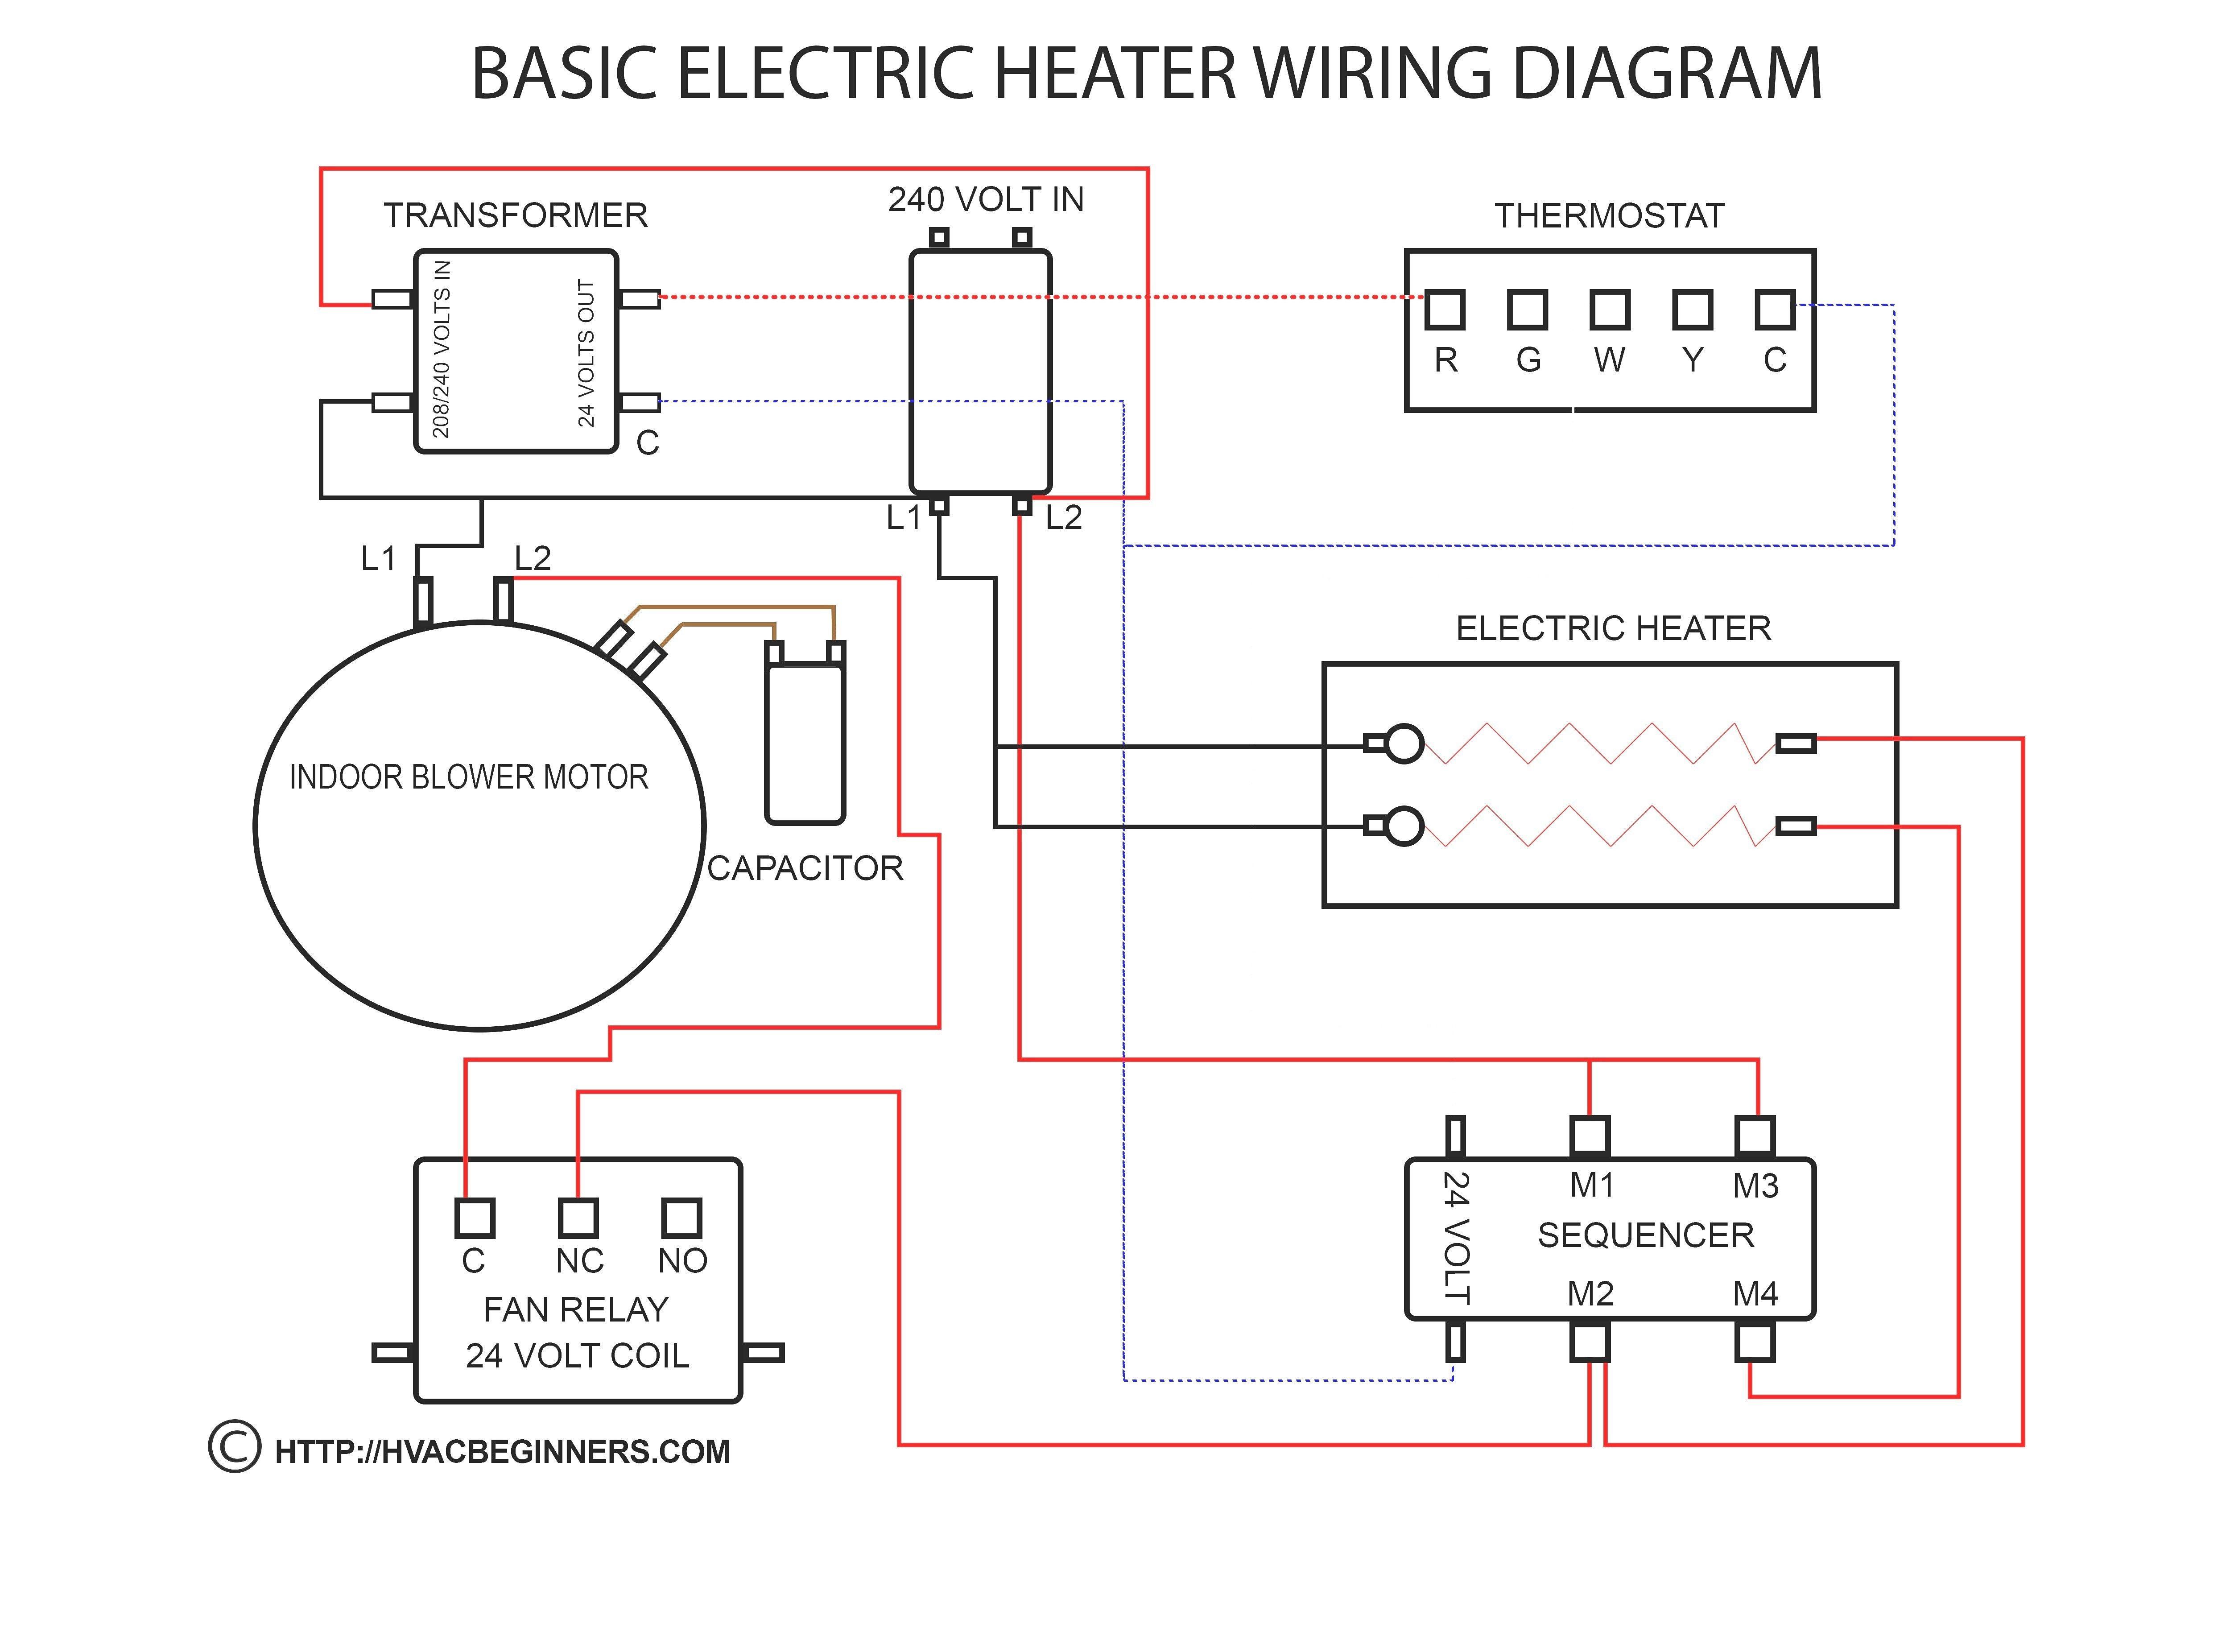 Window Air Conditioner Wiring Diagram In 2020 Basic Electrical Wiring Electrical Circuit Diagram Circuit Diagram